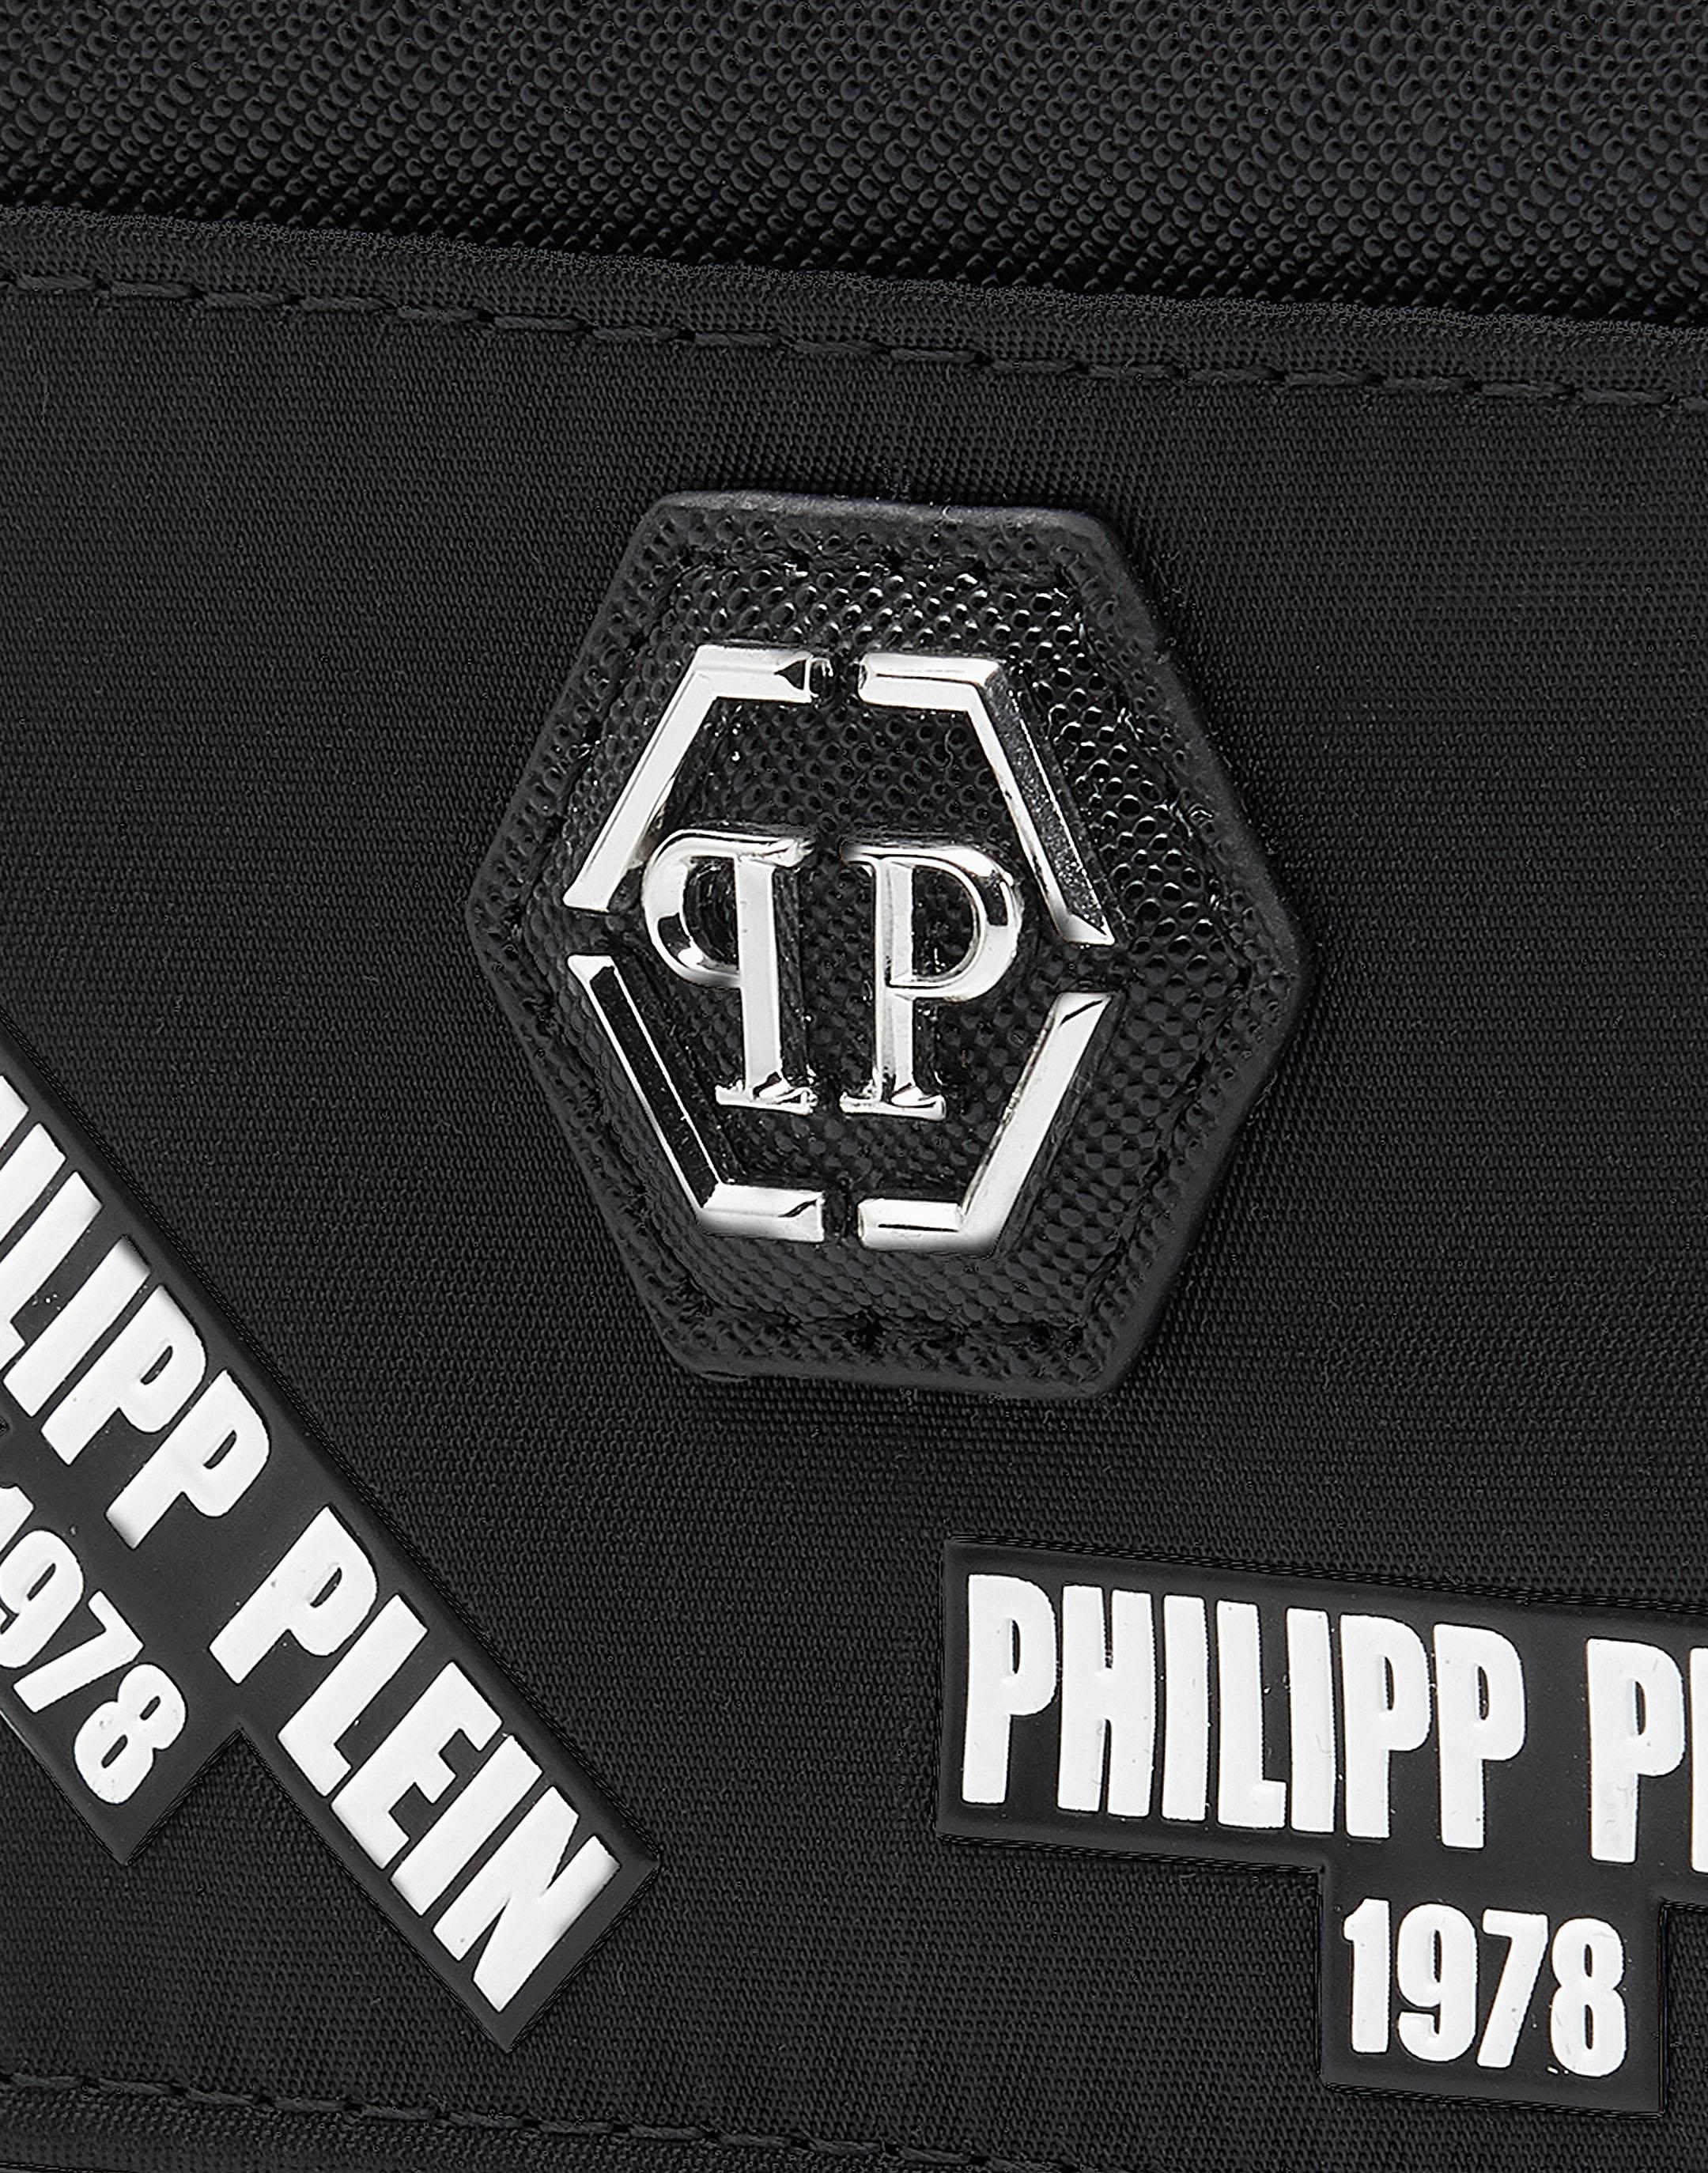 4b567208ac6 Credit Cards Holder PP1978 | Philipp Plein